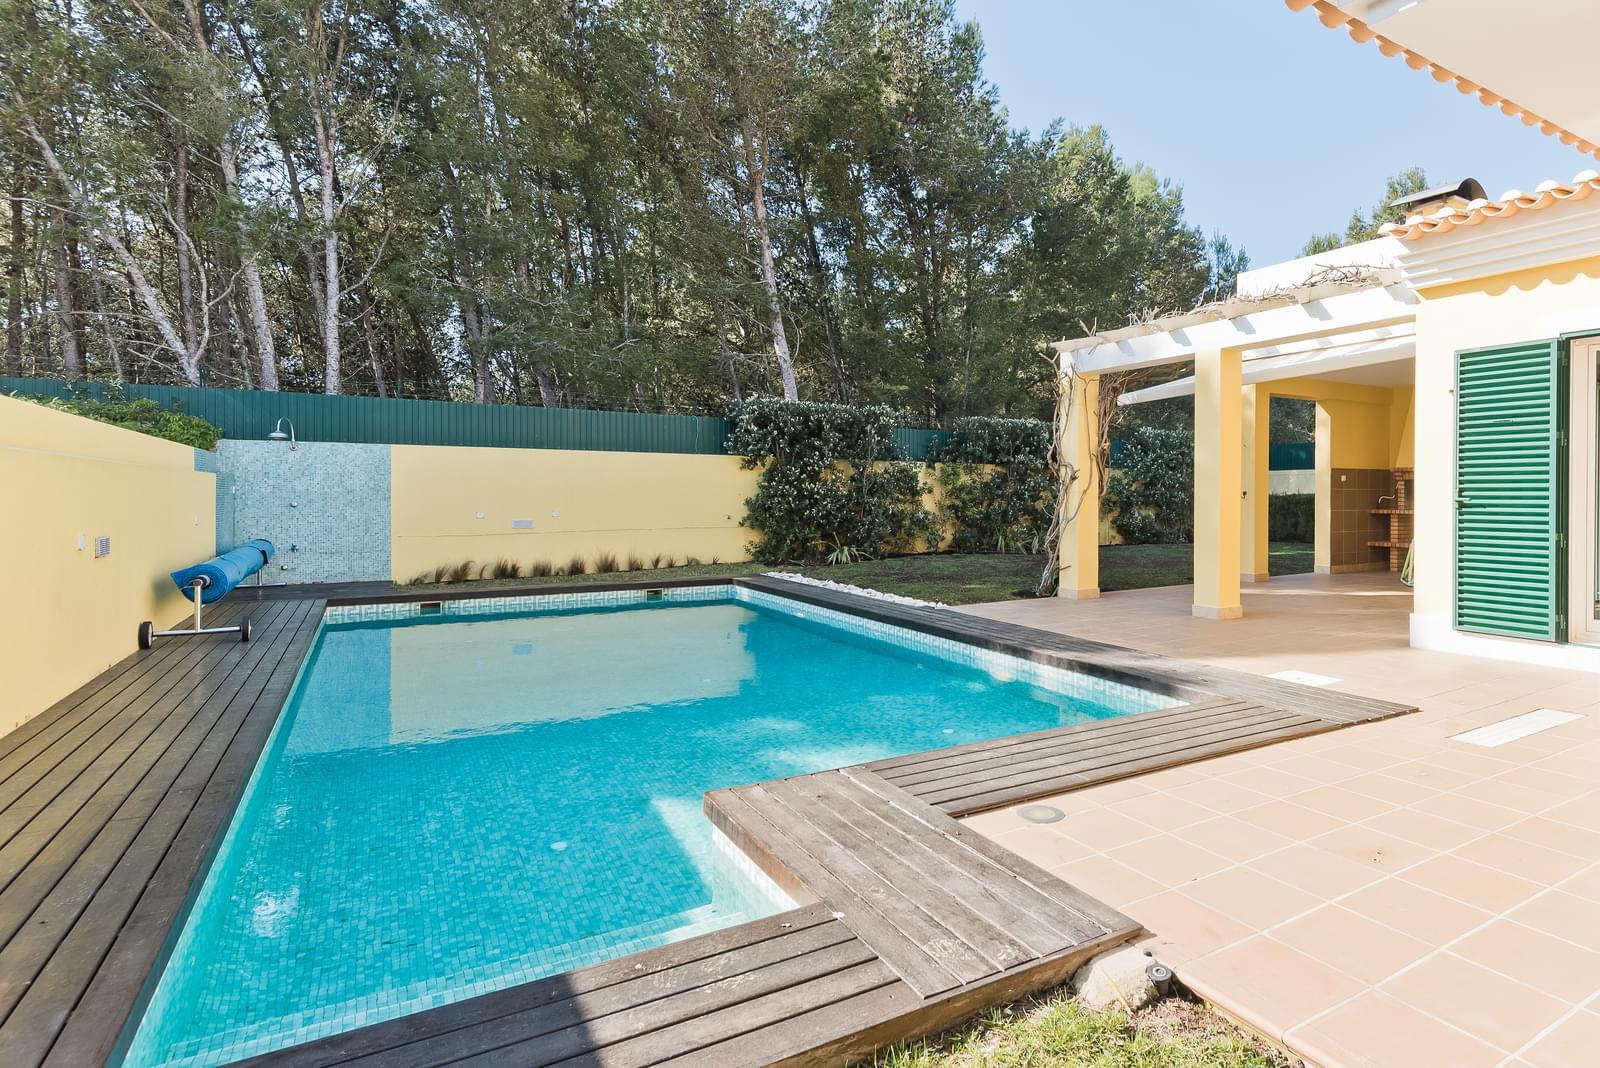 Moradia T4+2 com piscina